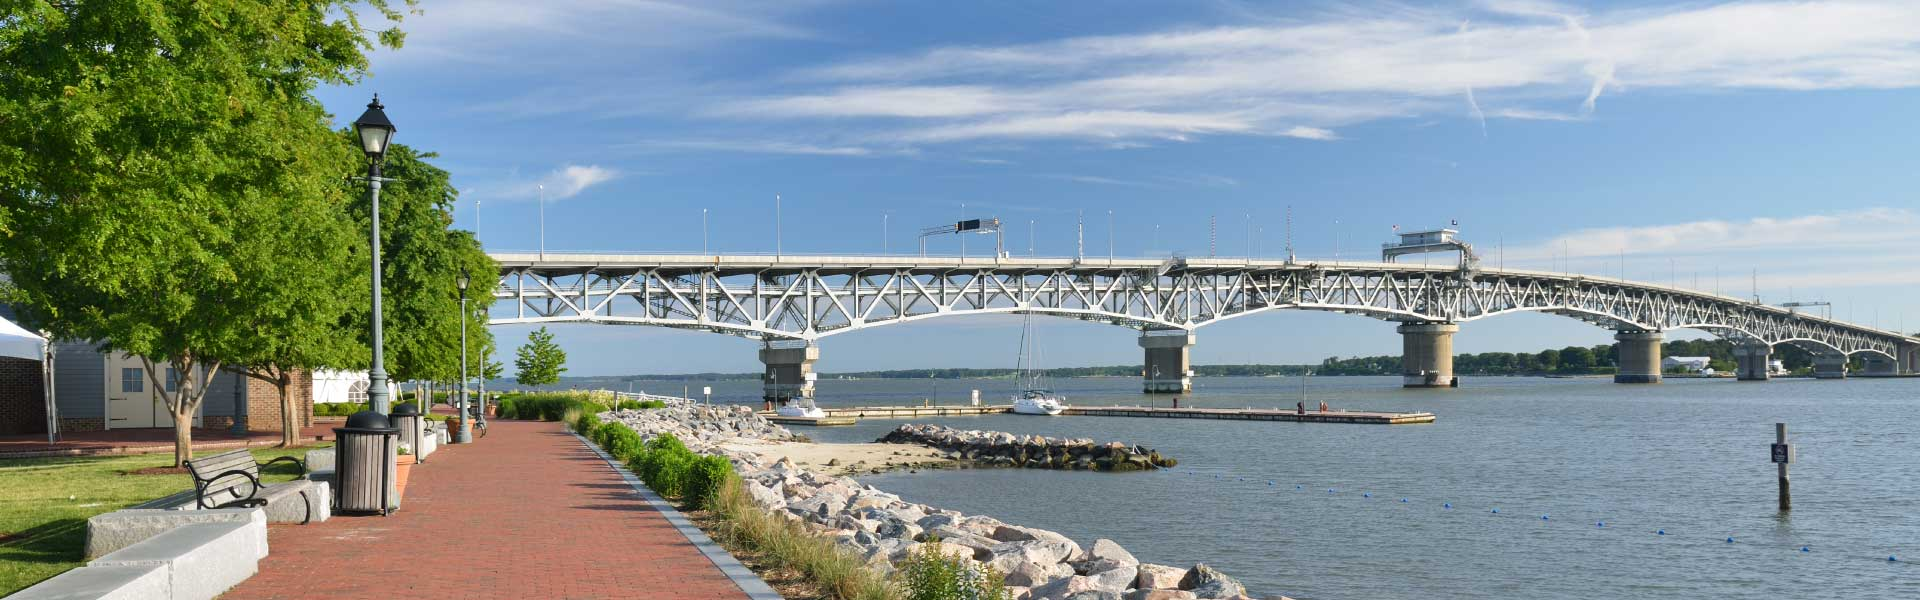 yorktown gloucester coleman bridge